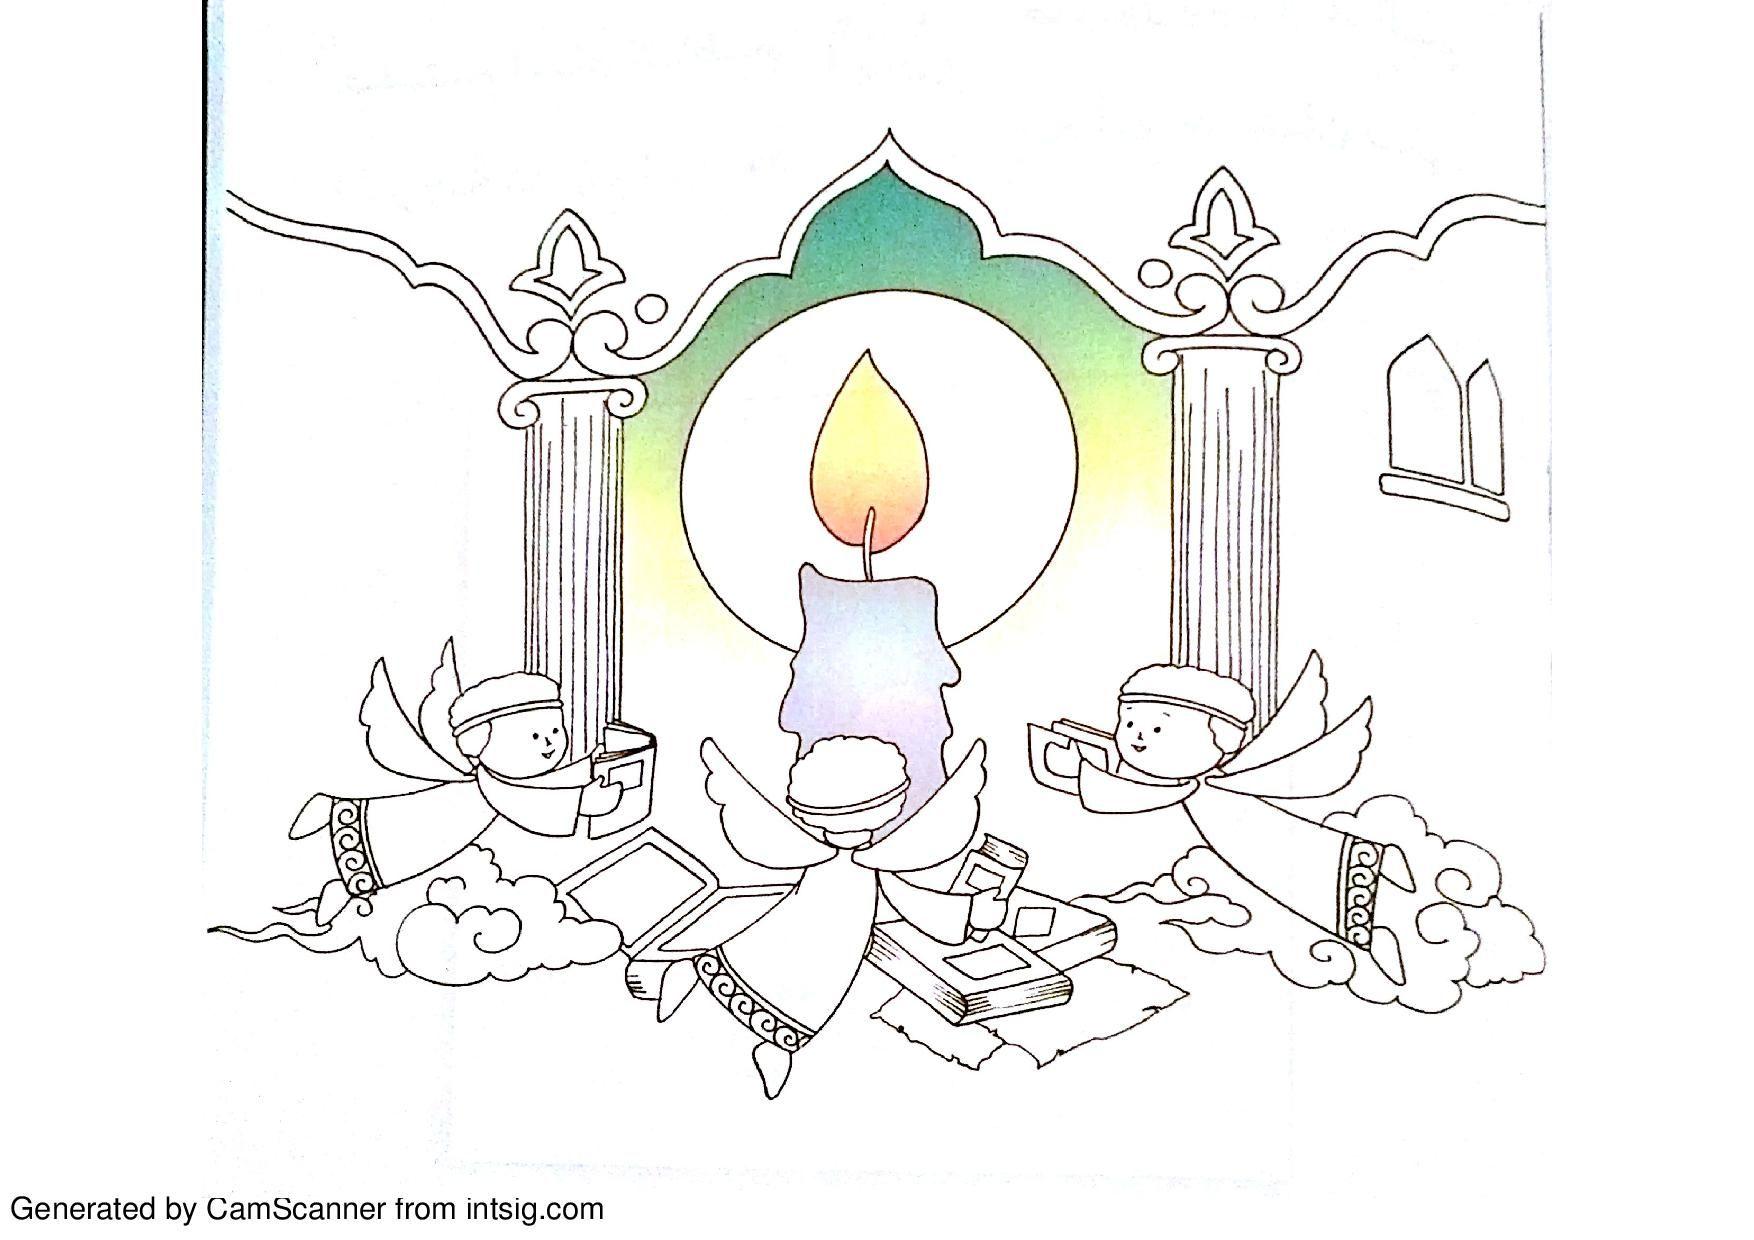 6th Imam Jaafar Assadigh Coloring